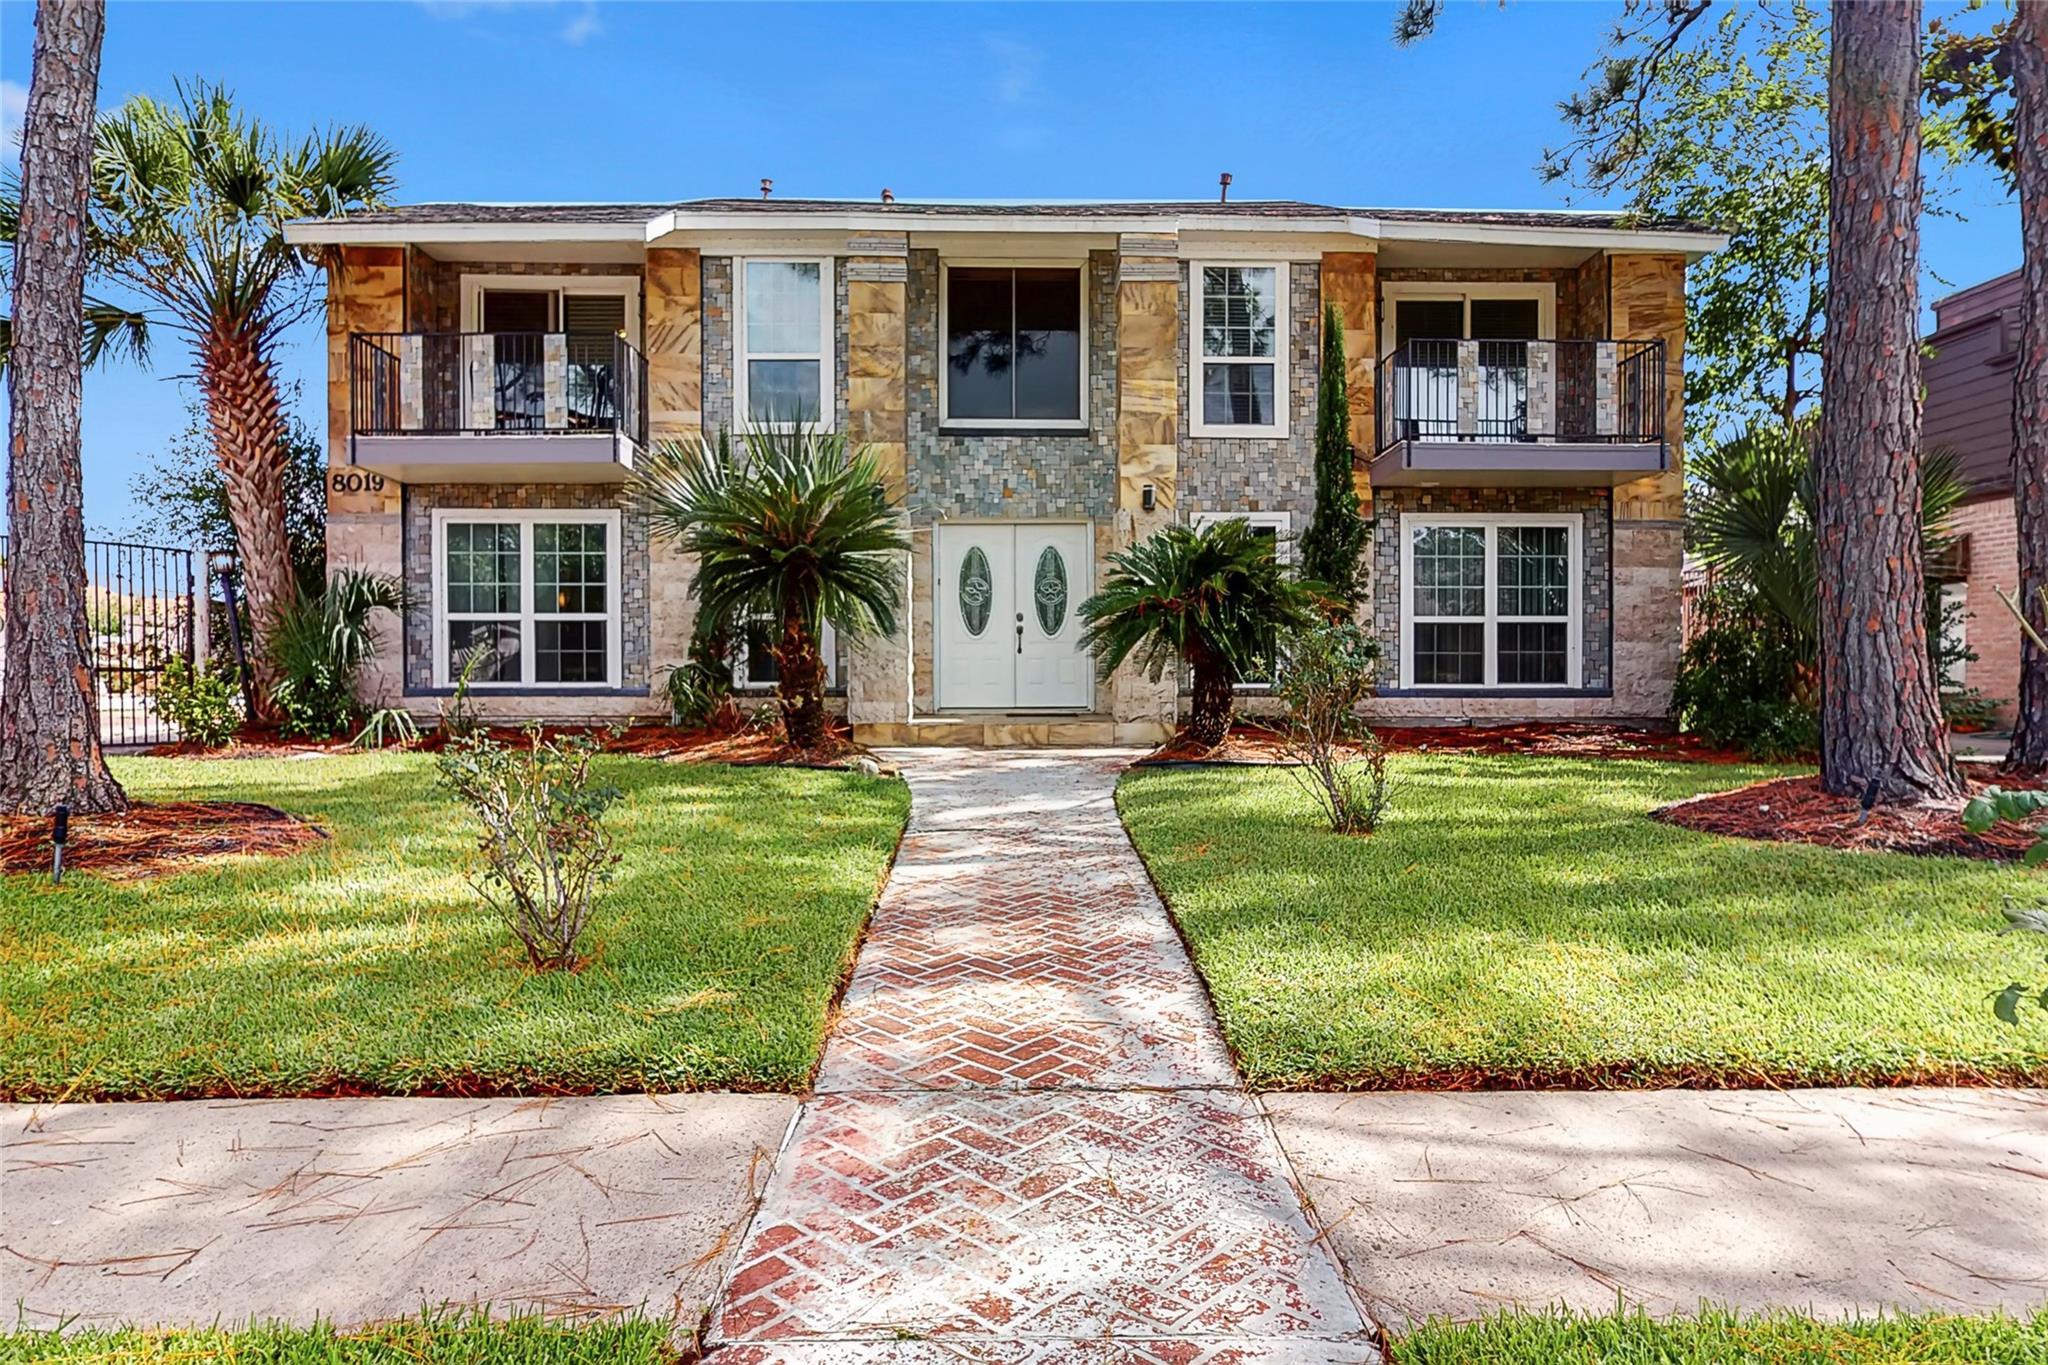 8019 Albin Lane Property Photo - Houston, TX real estate listing